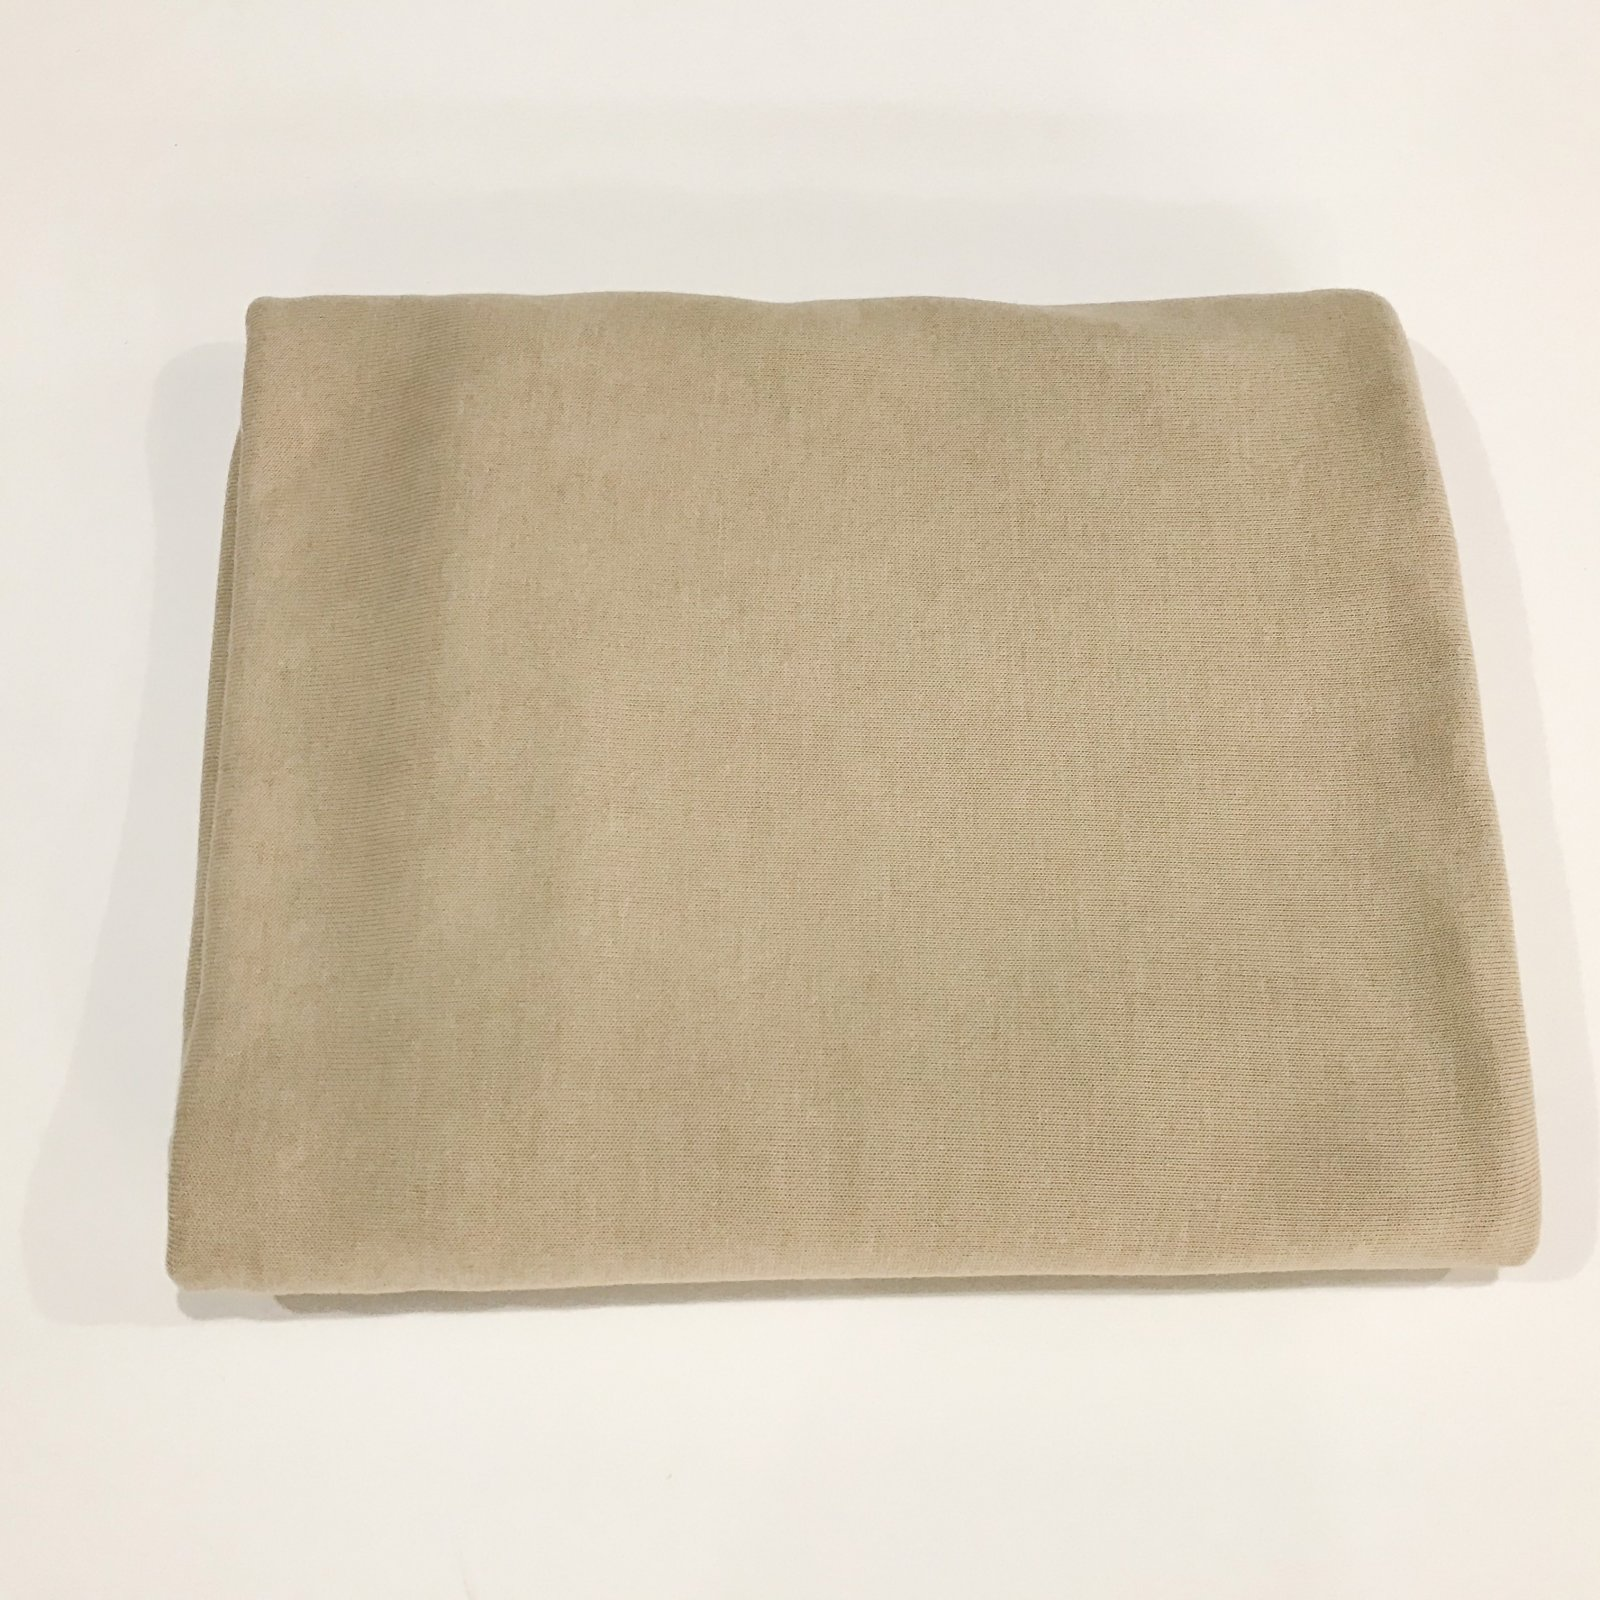 2 yards - Hacci Sweater Knit - Irish Cream